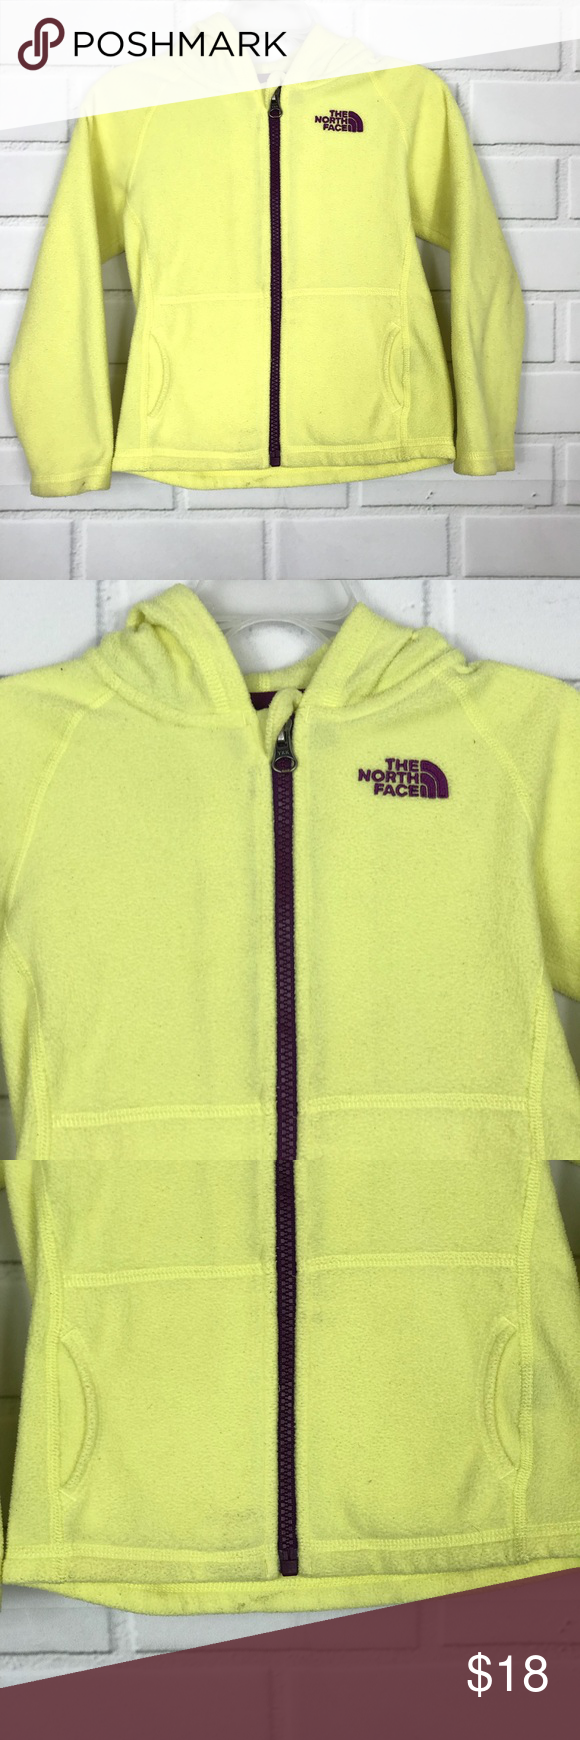 The North Face Girl Yellow Purple Fleece 4t Jacket North Face Girls North Face Jacket Jackets [ 1740 x 580 Pixel ]